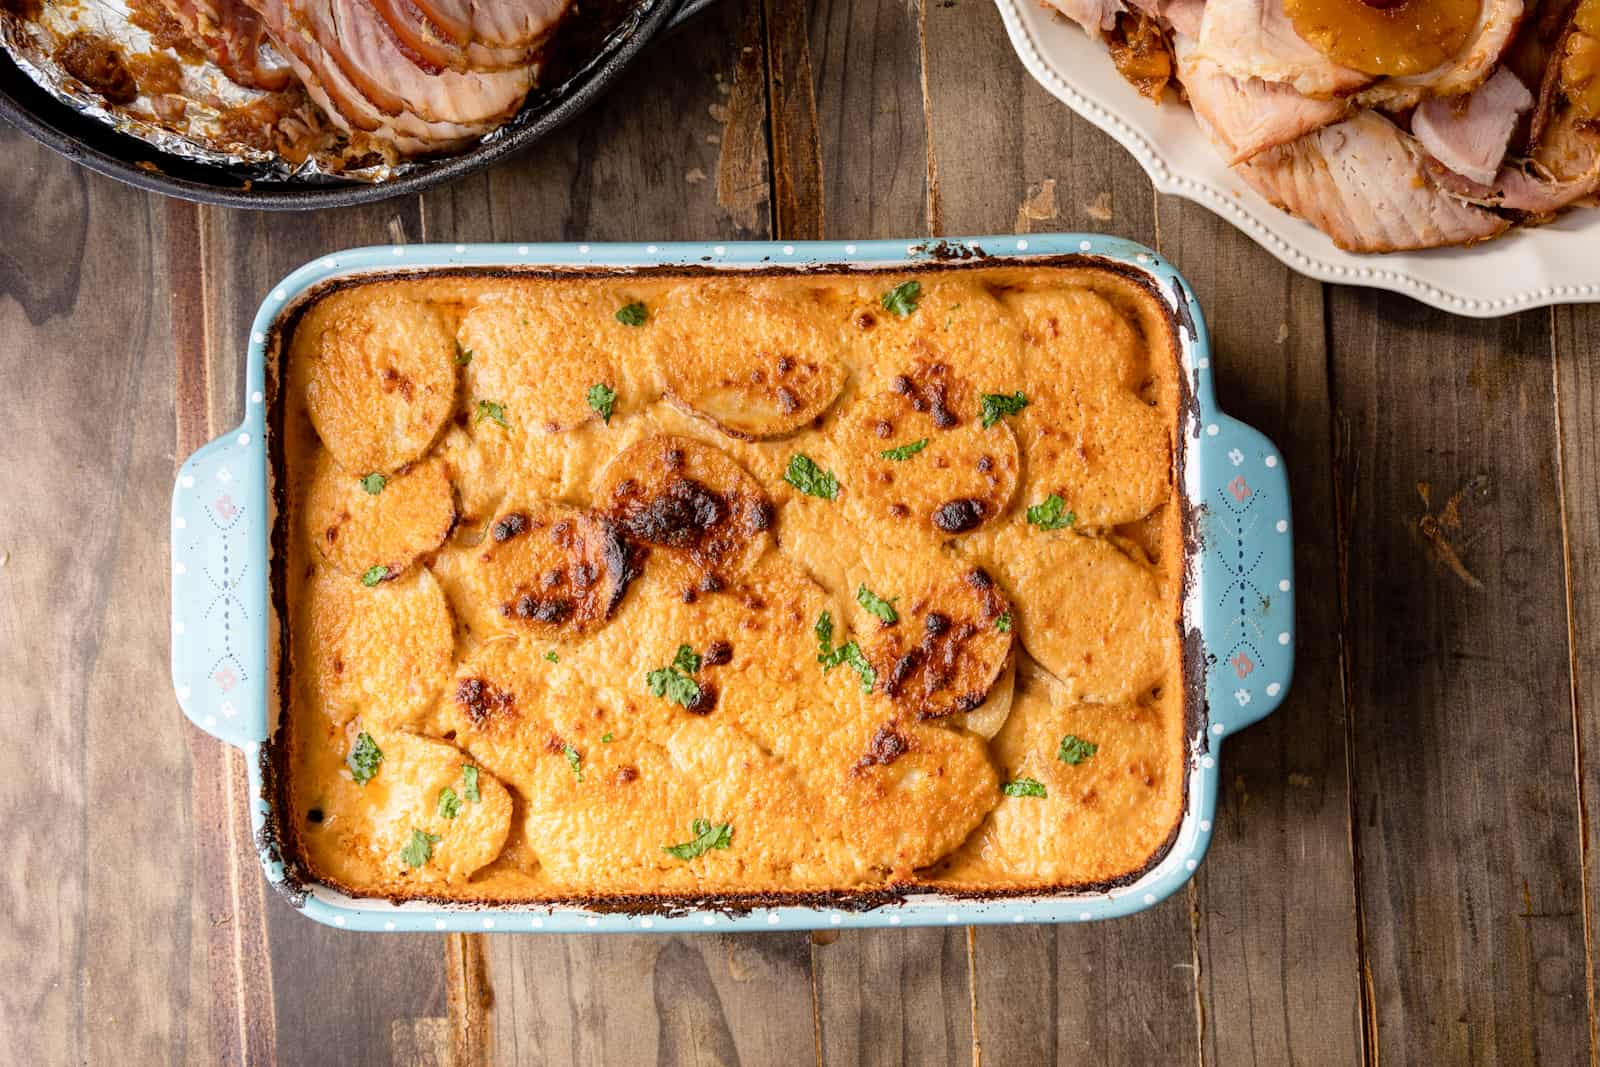 cheesy scalloped potatoes in a baking dish